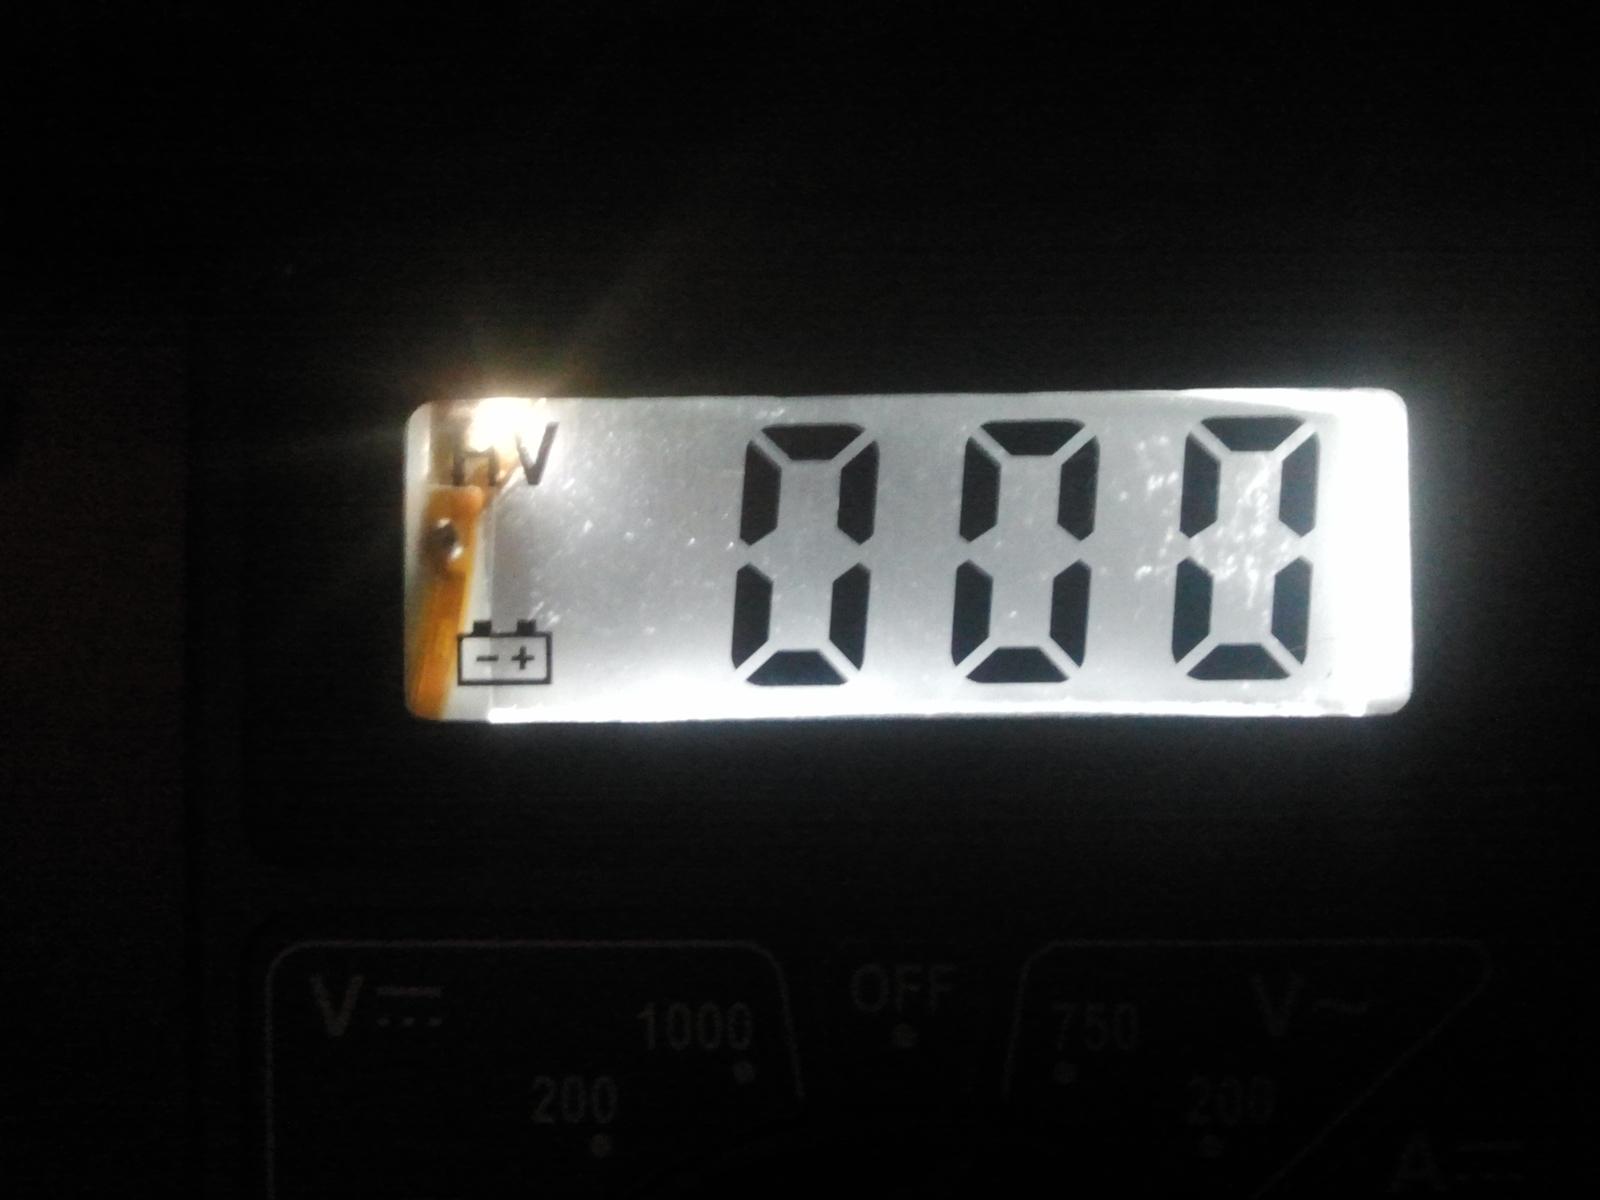 Мультиметр подсветка своими руками